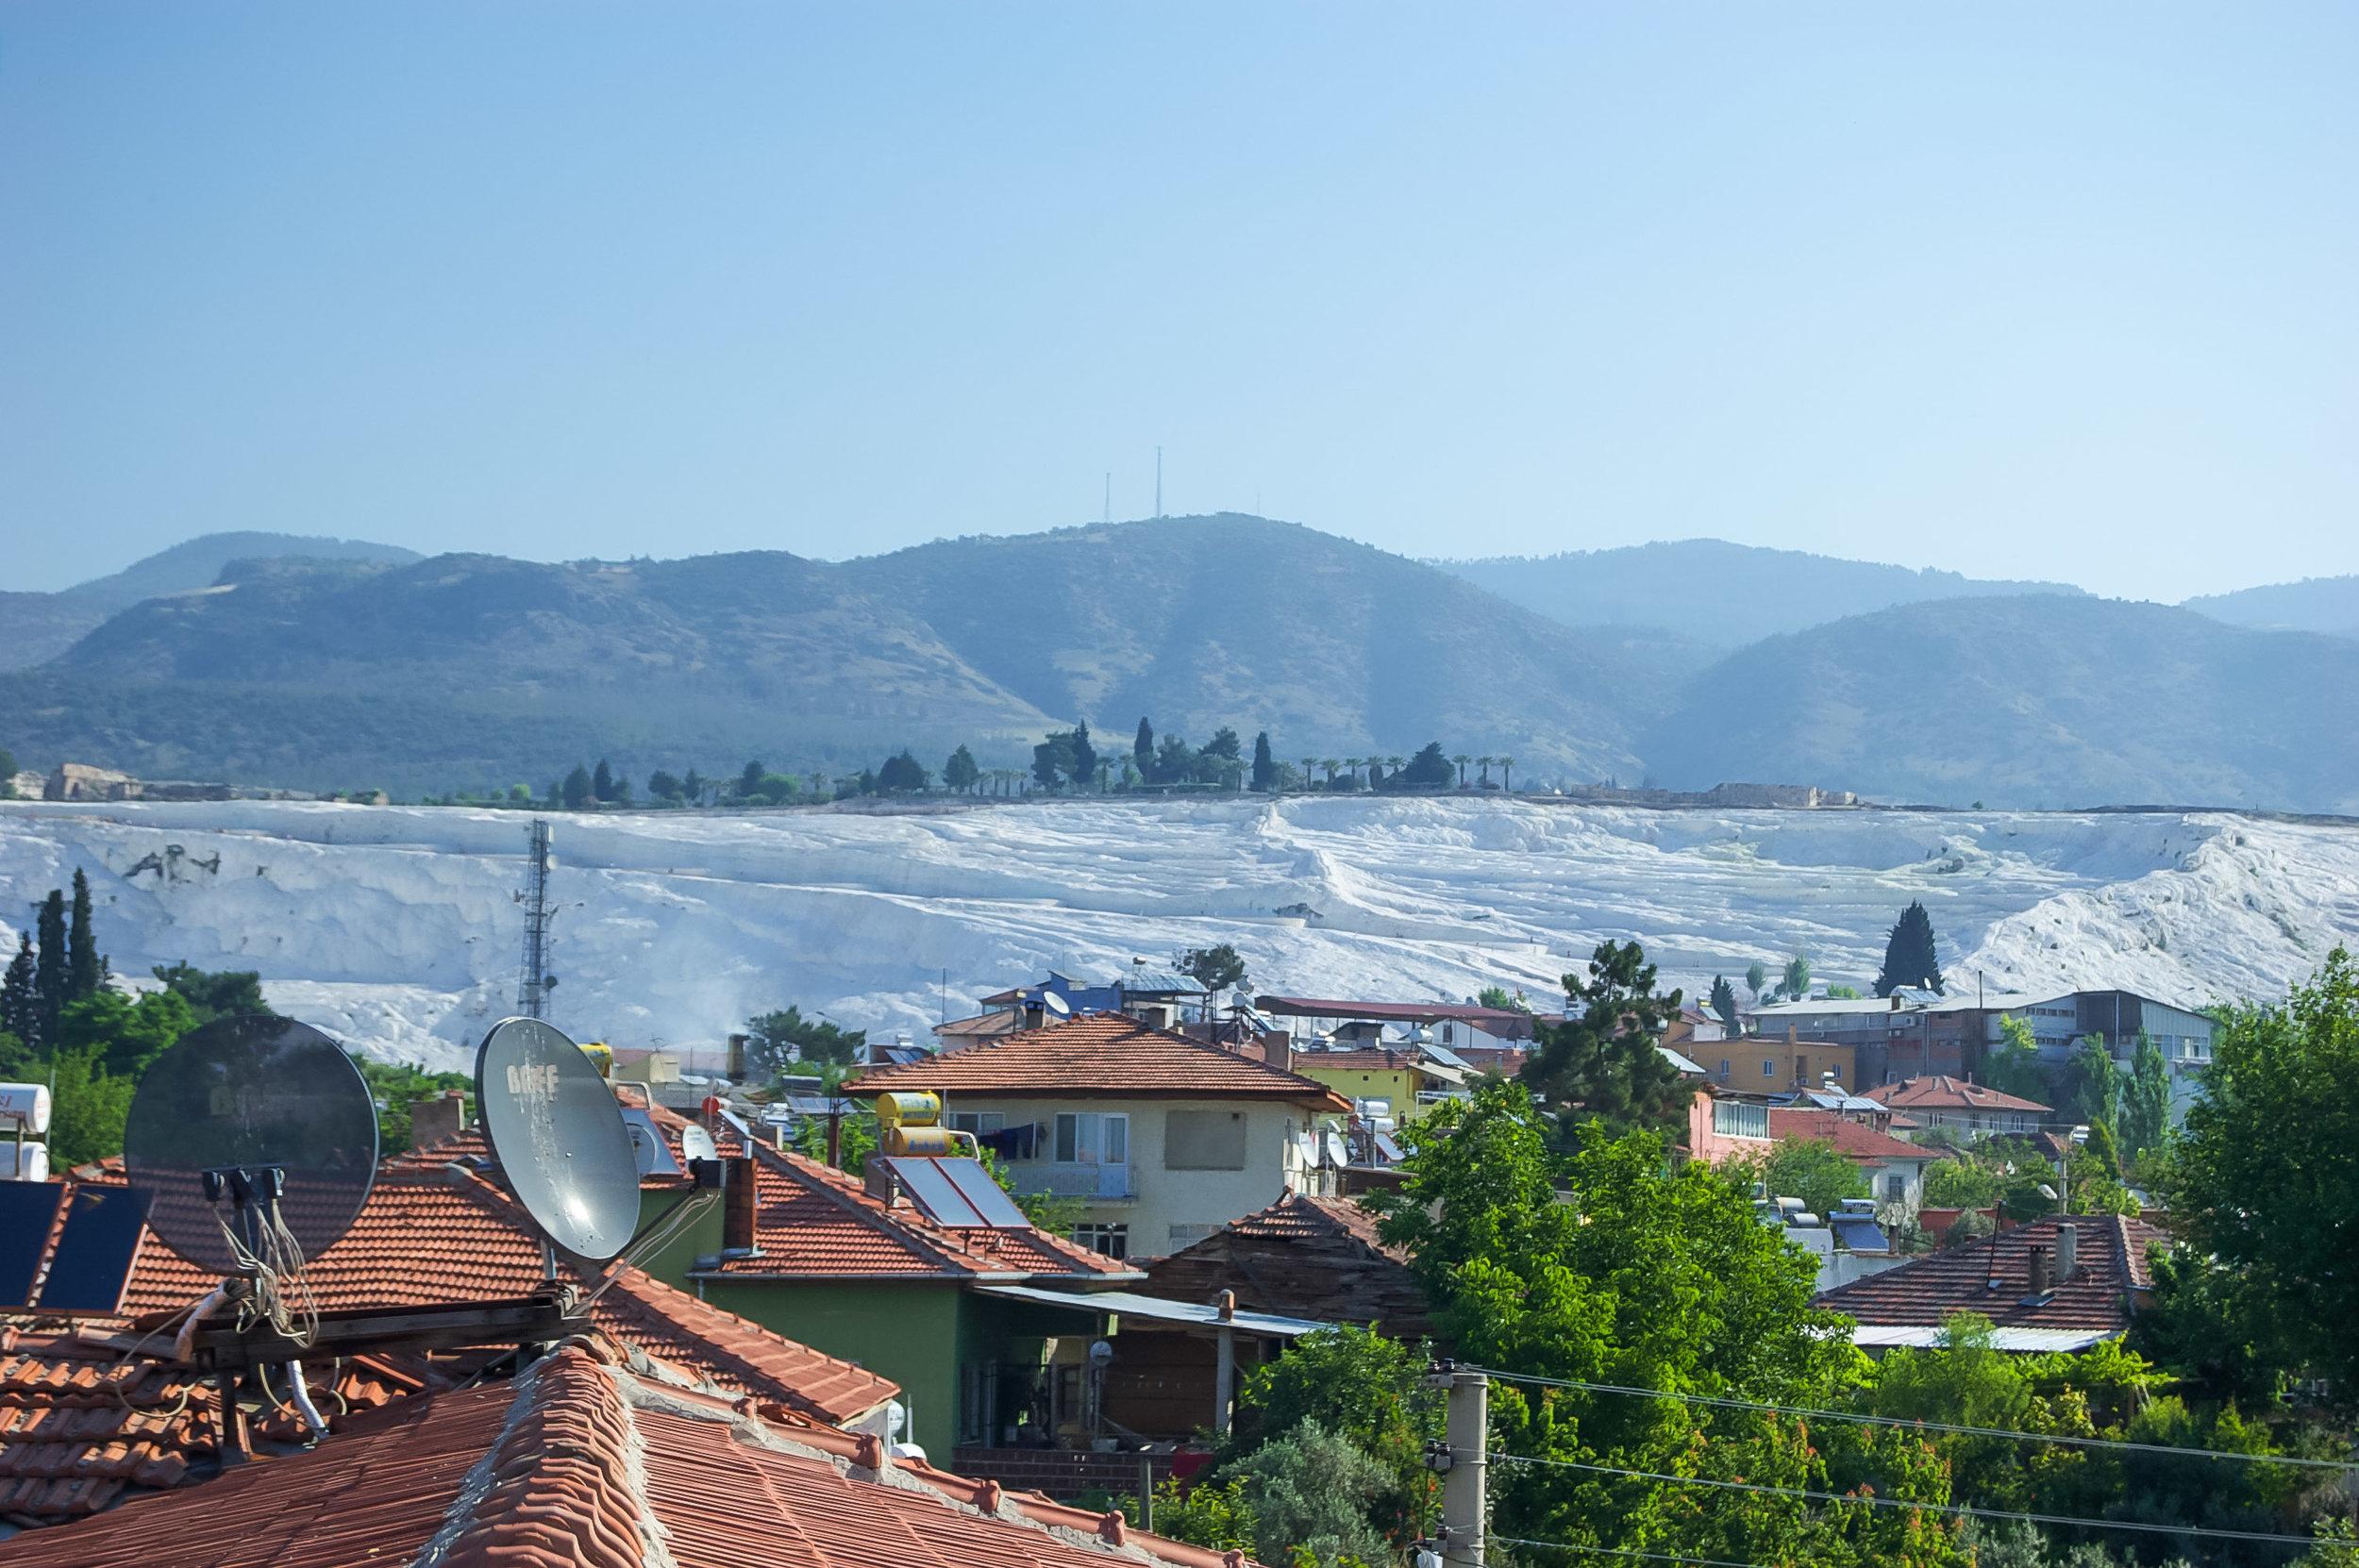 Travertines of Pamukkale Roman Architecture Blue Sky Turkey